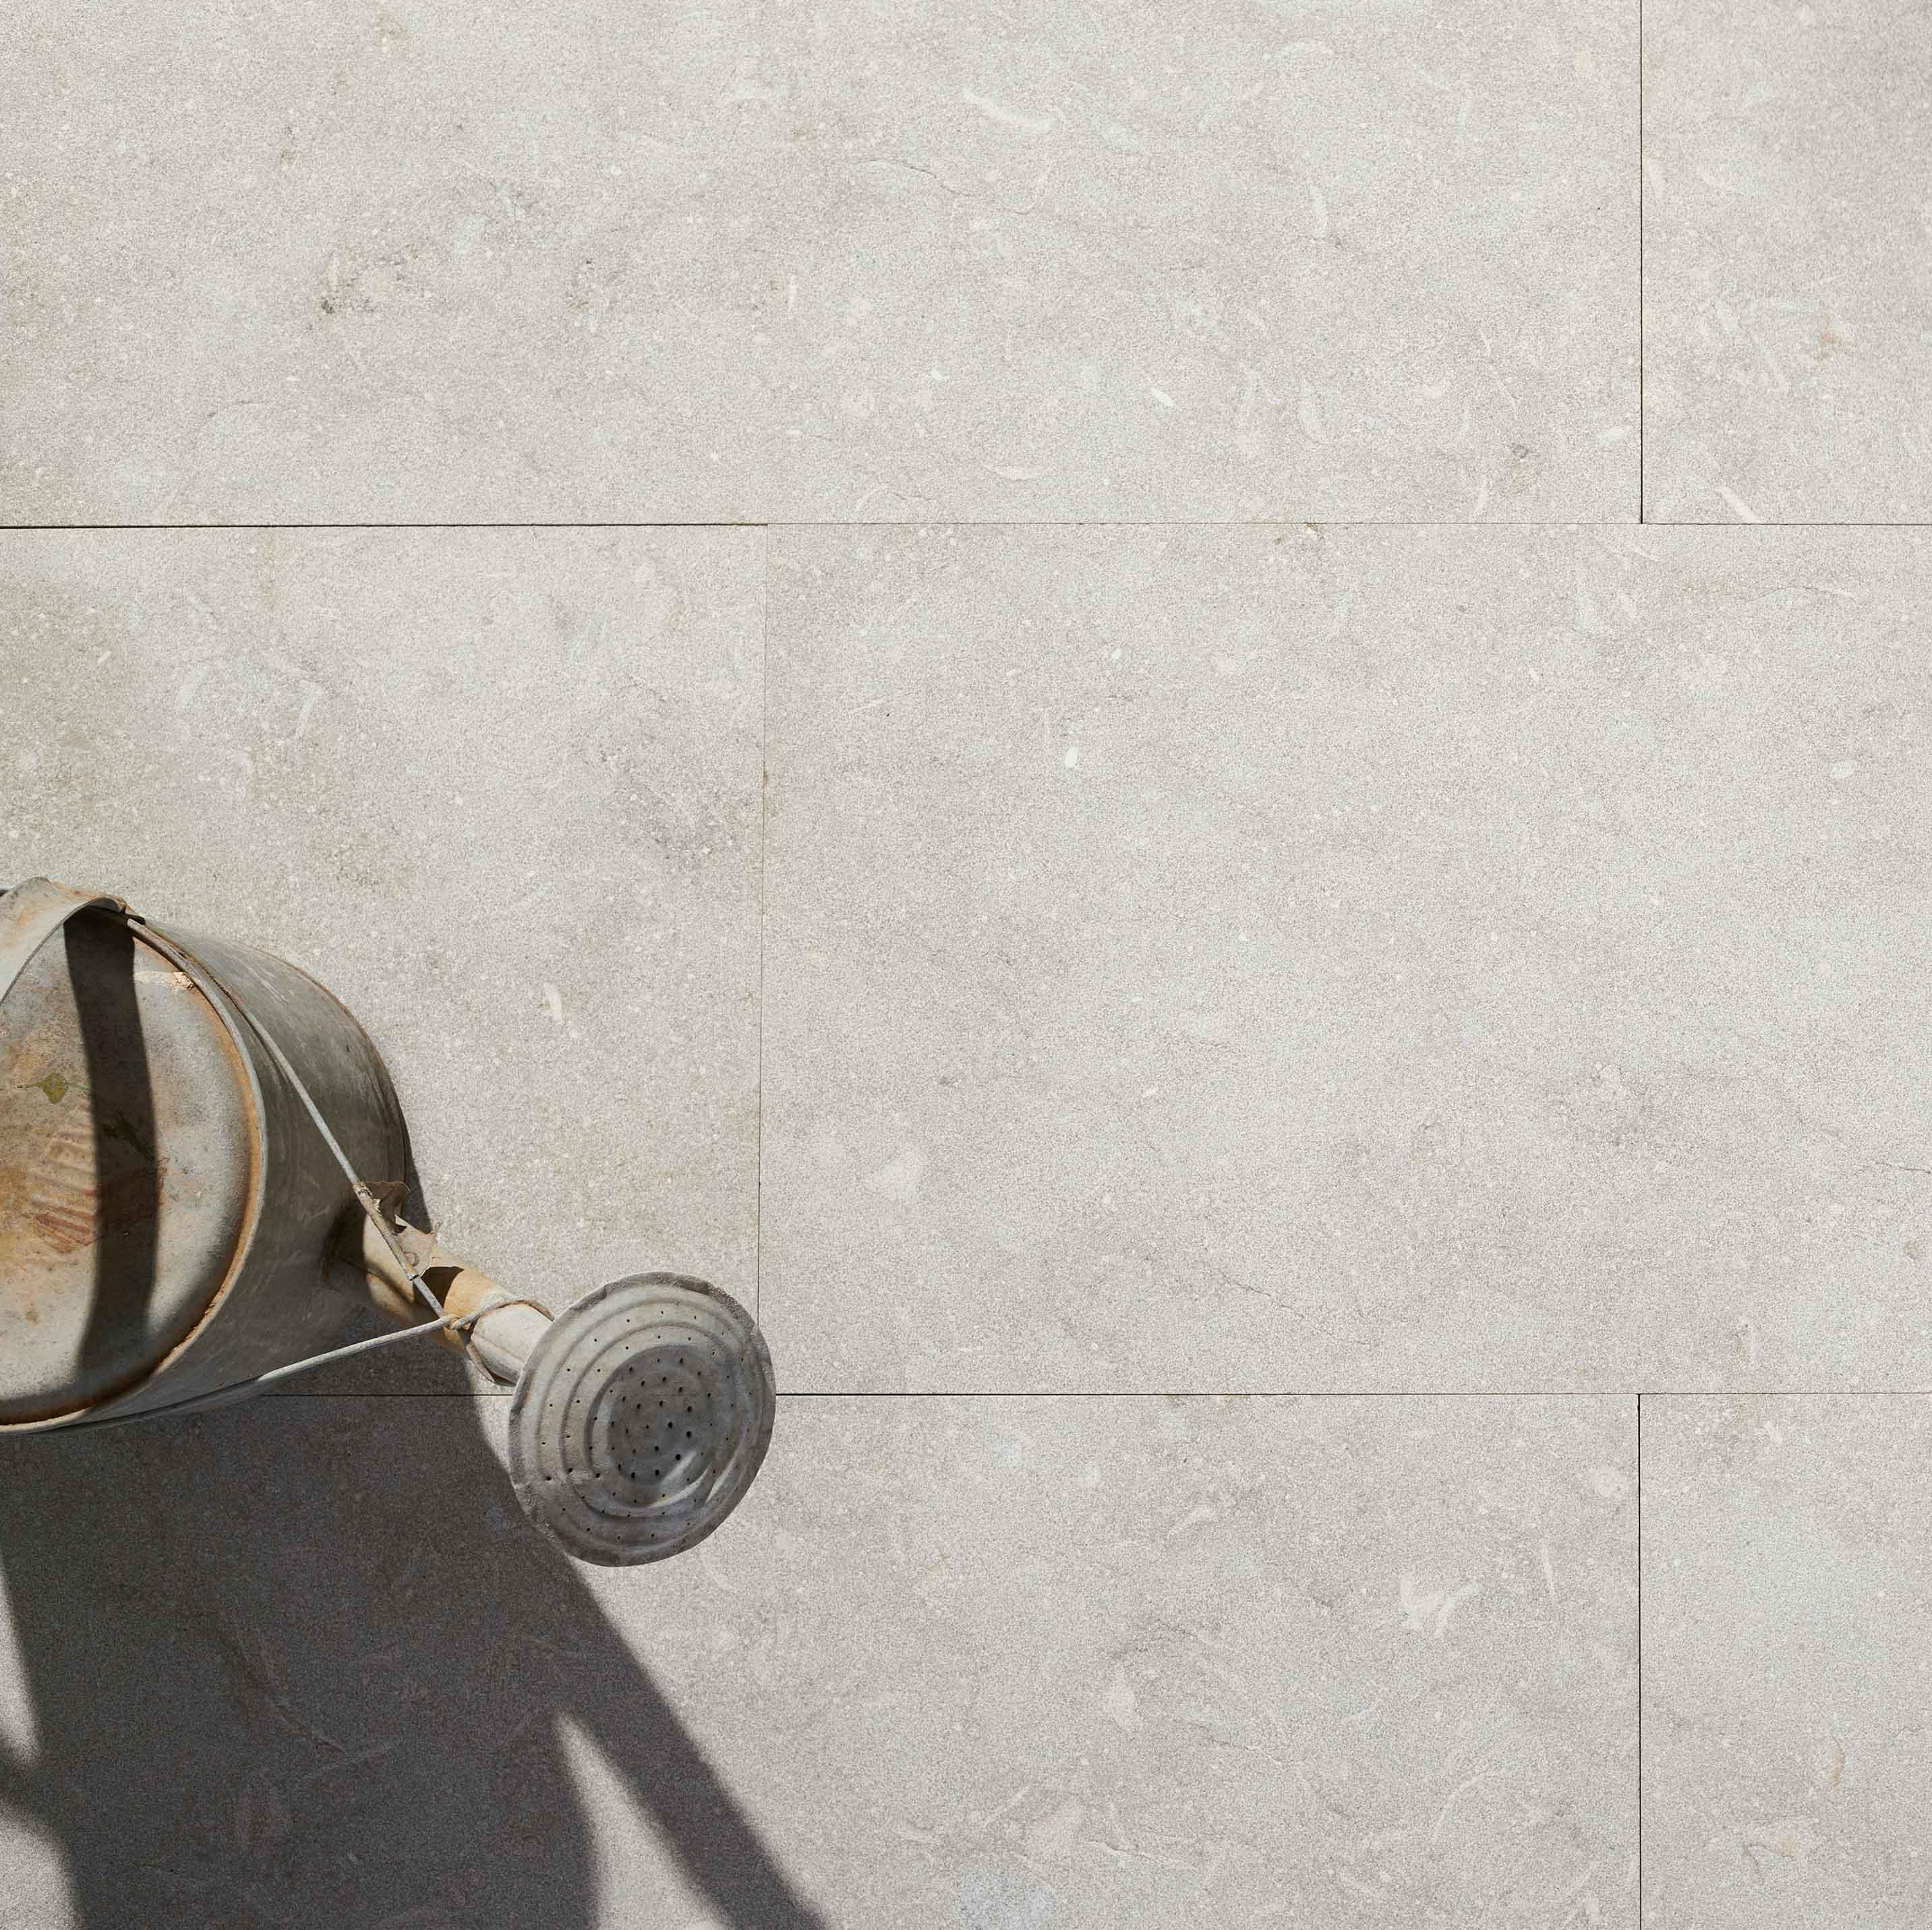 Stone-Pavers-and-Tiles-Outdoor Hero matala